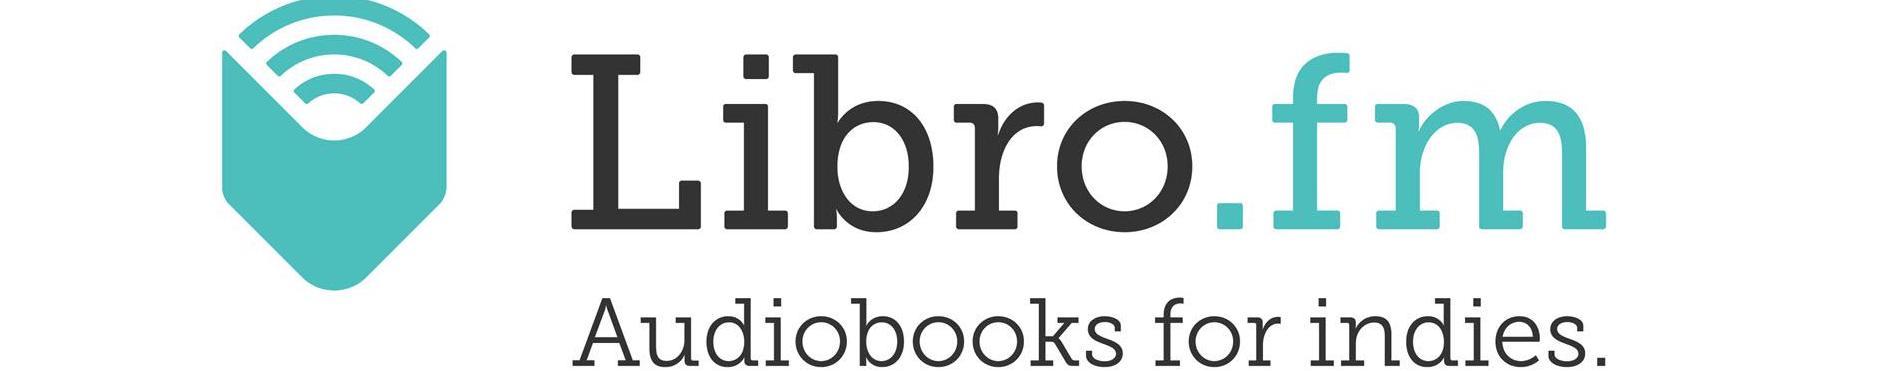 Slideshow image for Libro.fm audiobooks